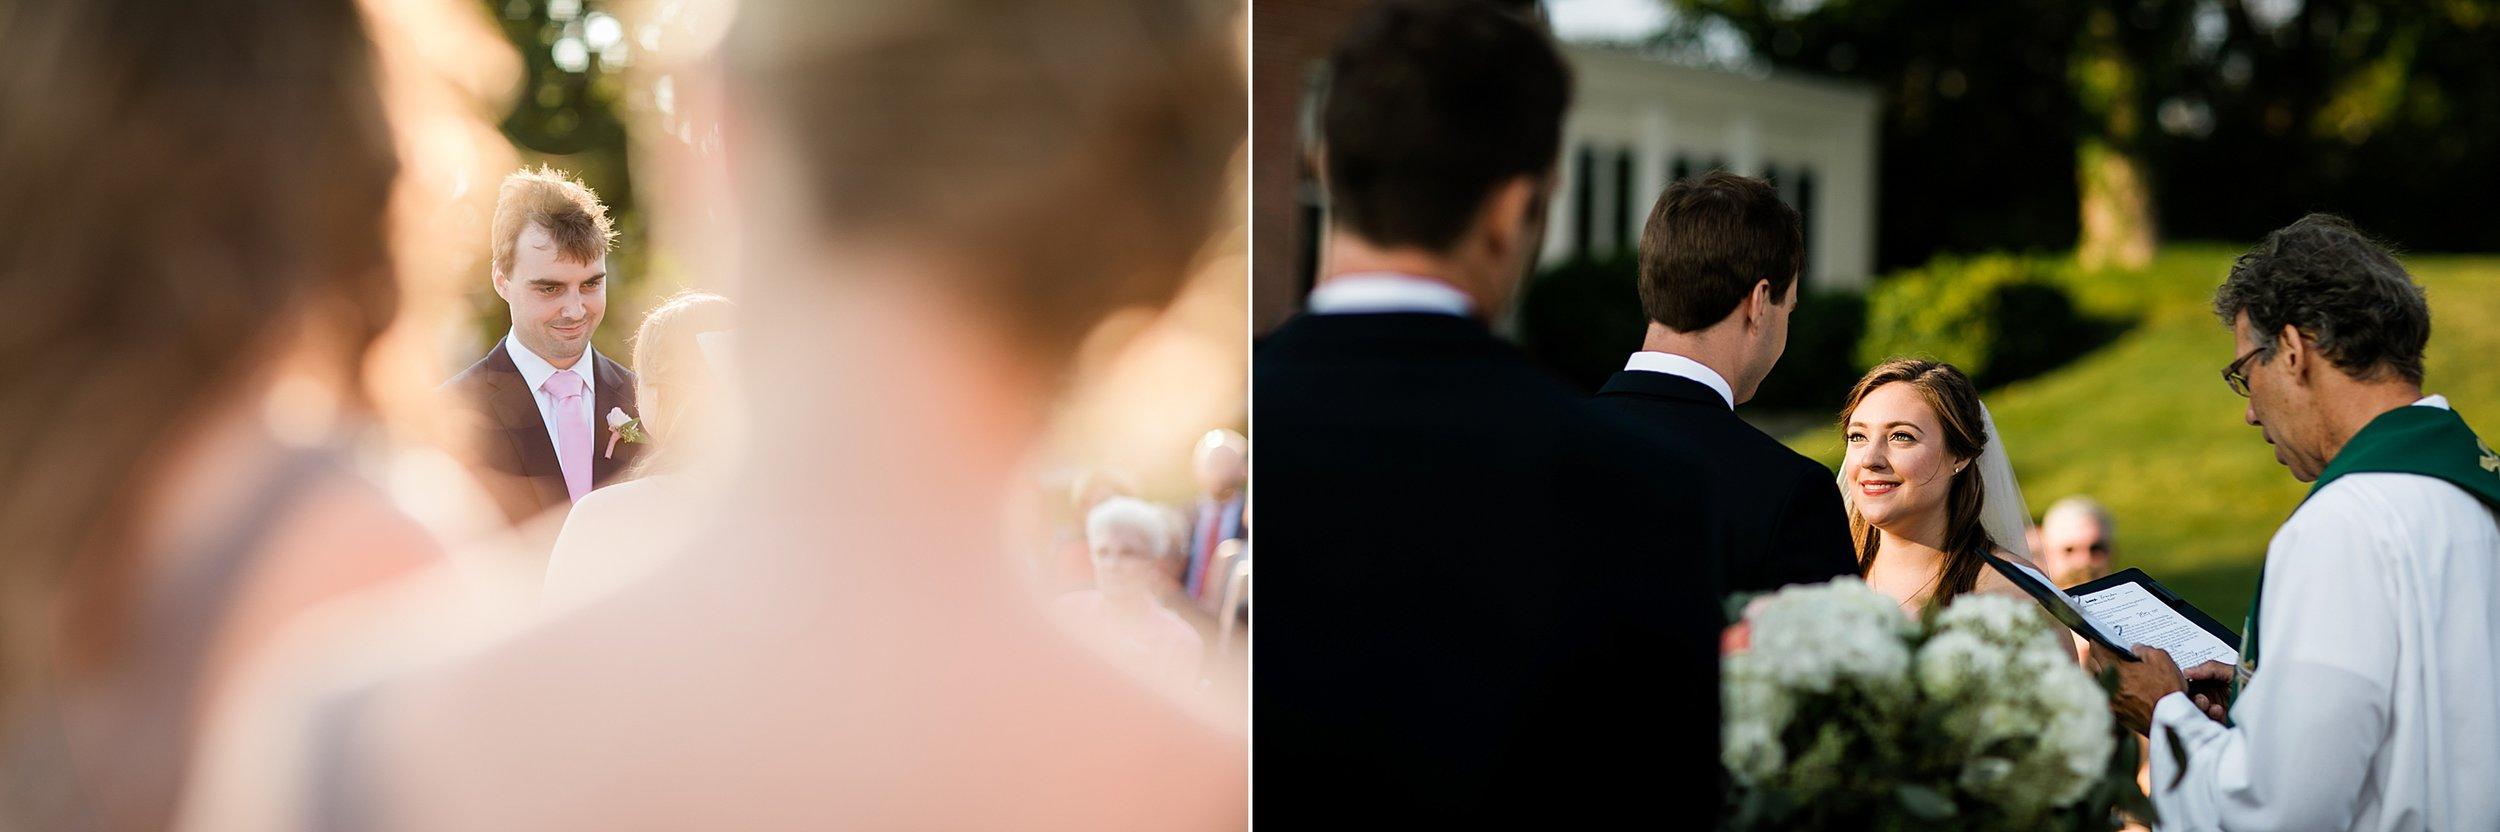 029 los angeles wedding photographer todd danforth photography boston.jpg